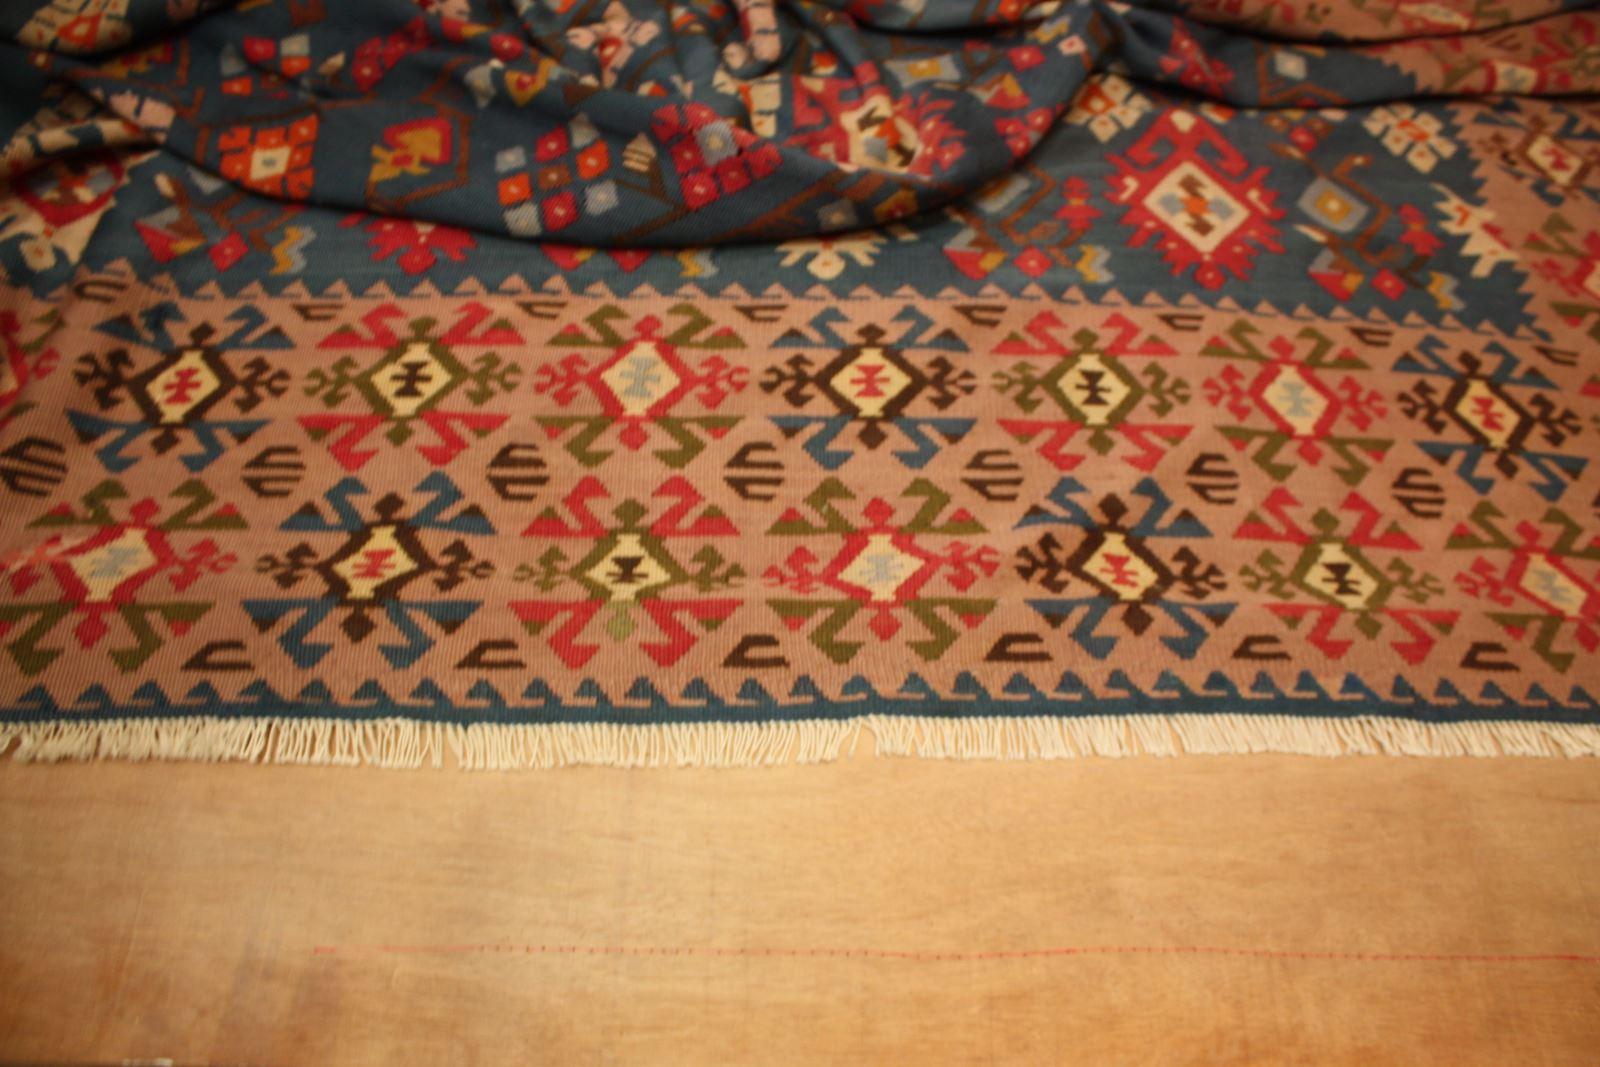 Carpet Fringe By The Yard Uk Carpet Vidalondon